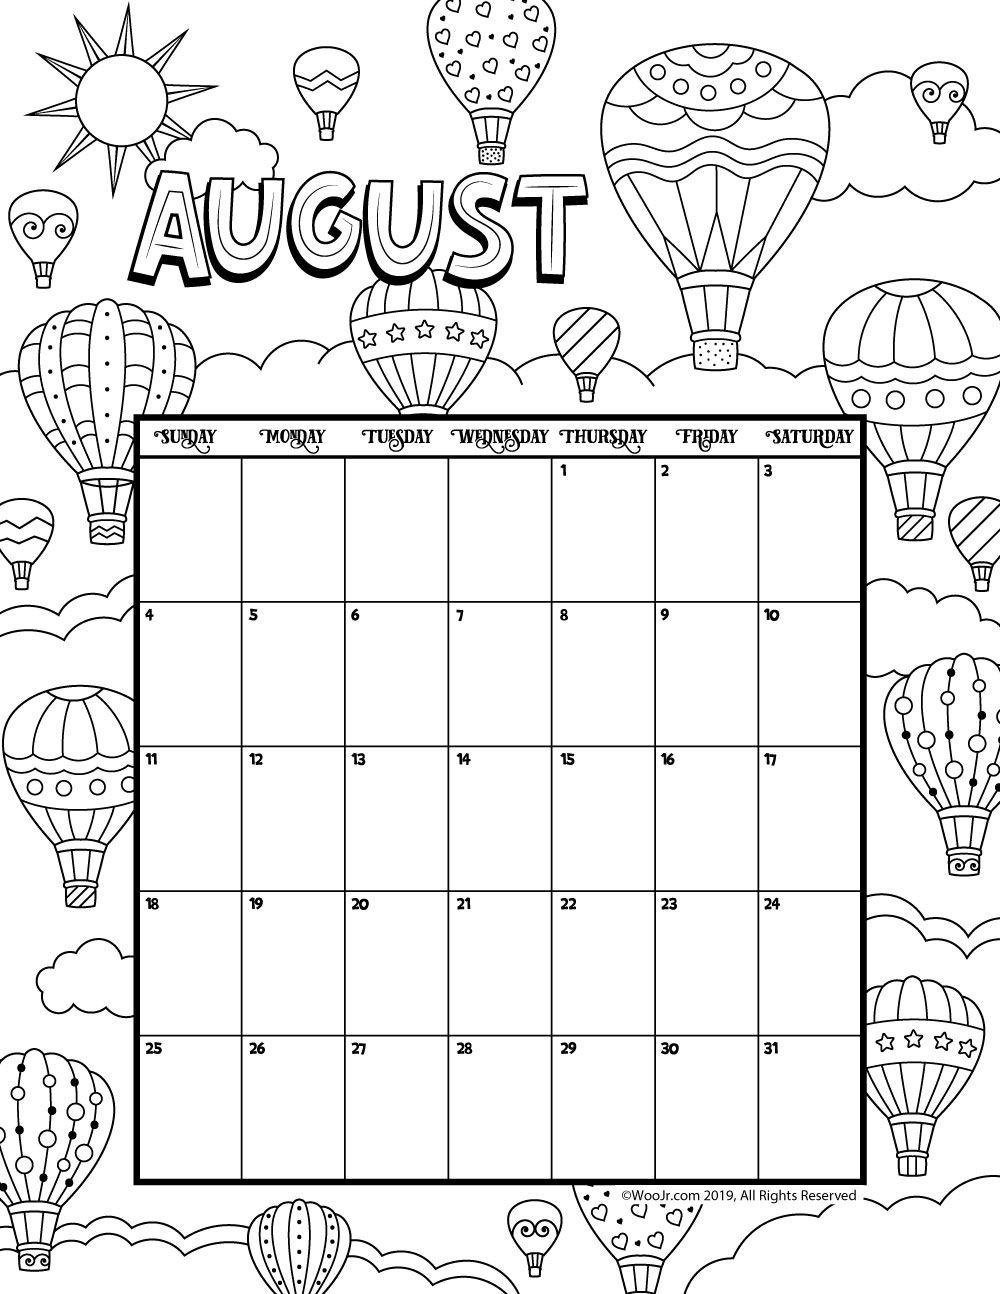 Take Kids August Calendar